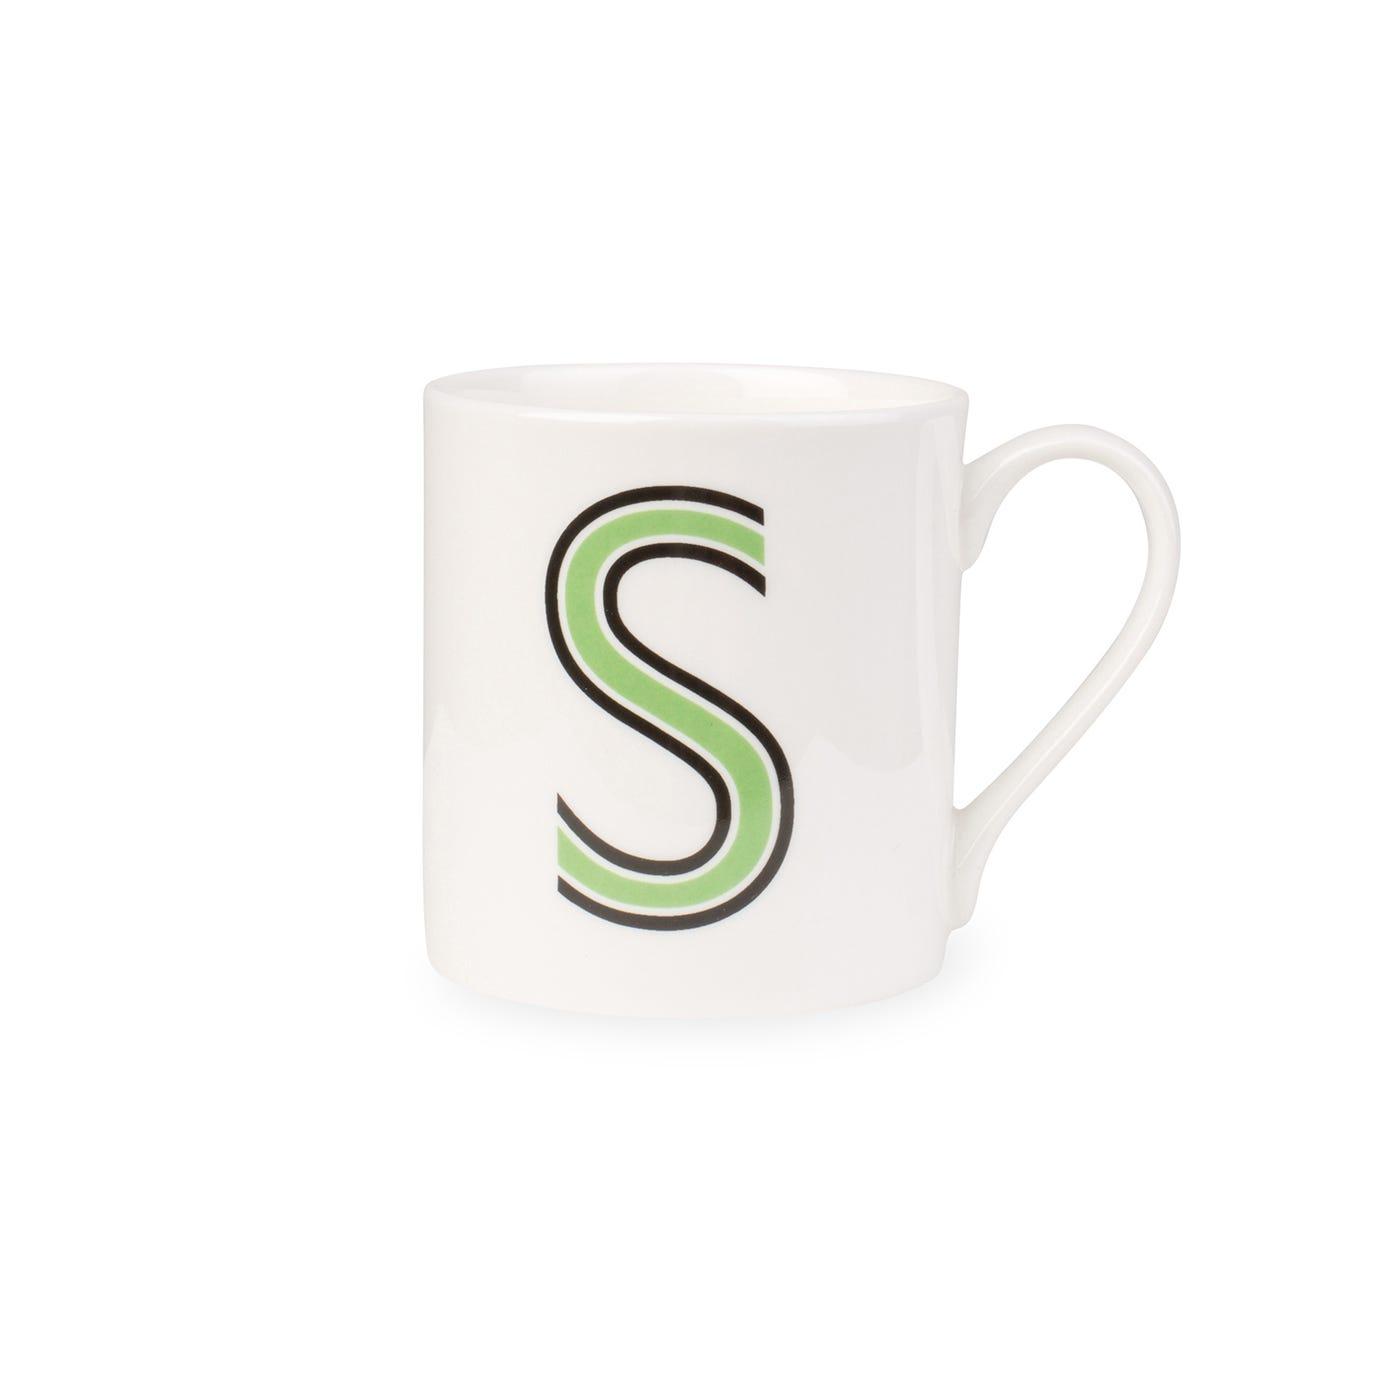 Heal's Heritage Alphabet Mug S